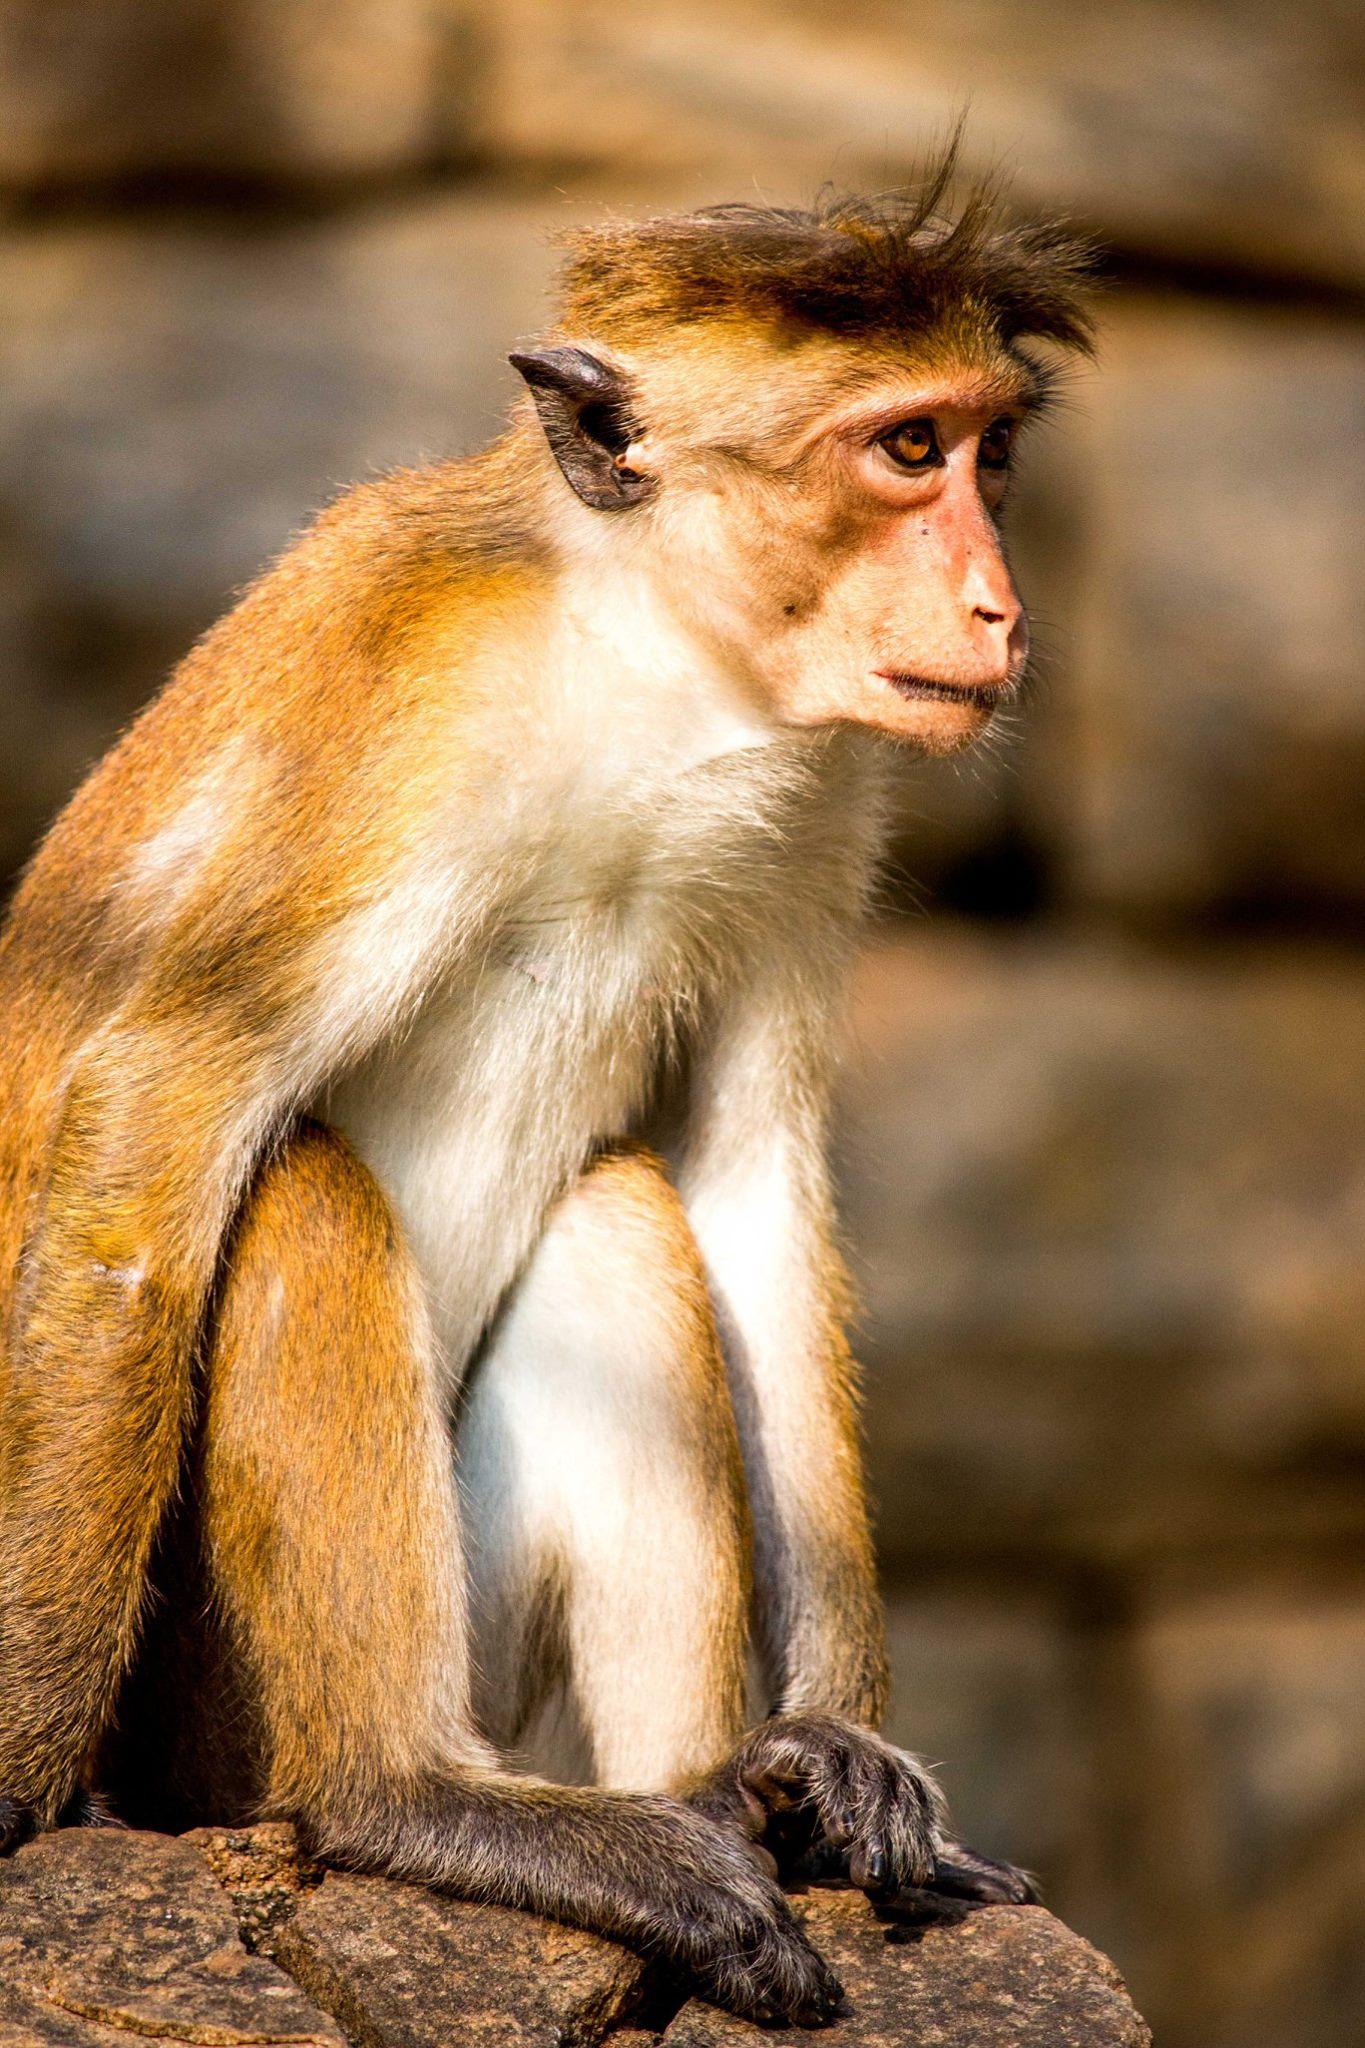 invite-to-paradise-sri-lanka-and-maldives-specialists-travel-agent-tour-operator-customer-review--feedback-joel-rhian-monkey-6.jpg